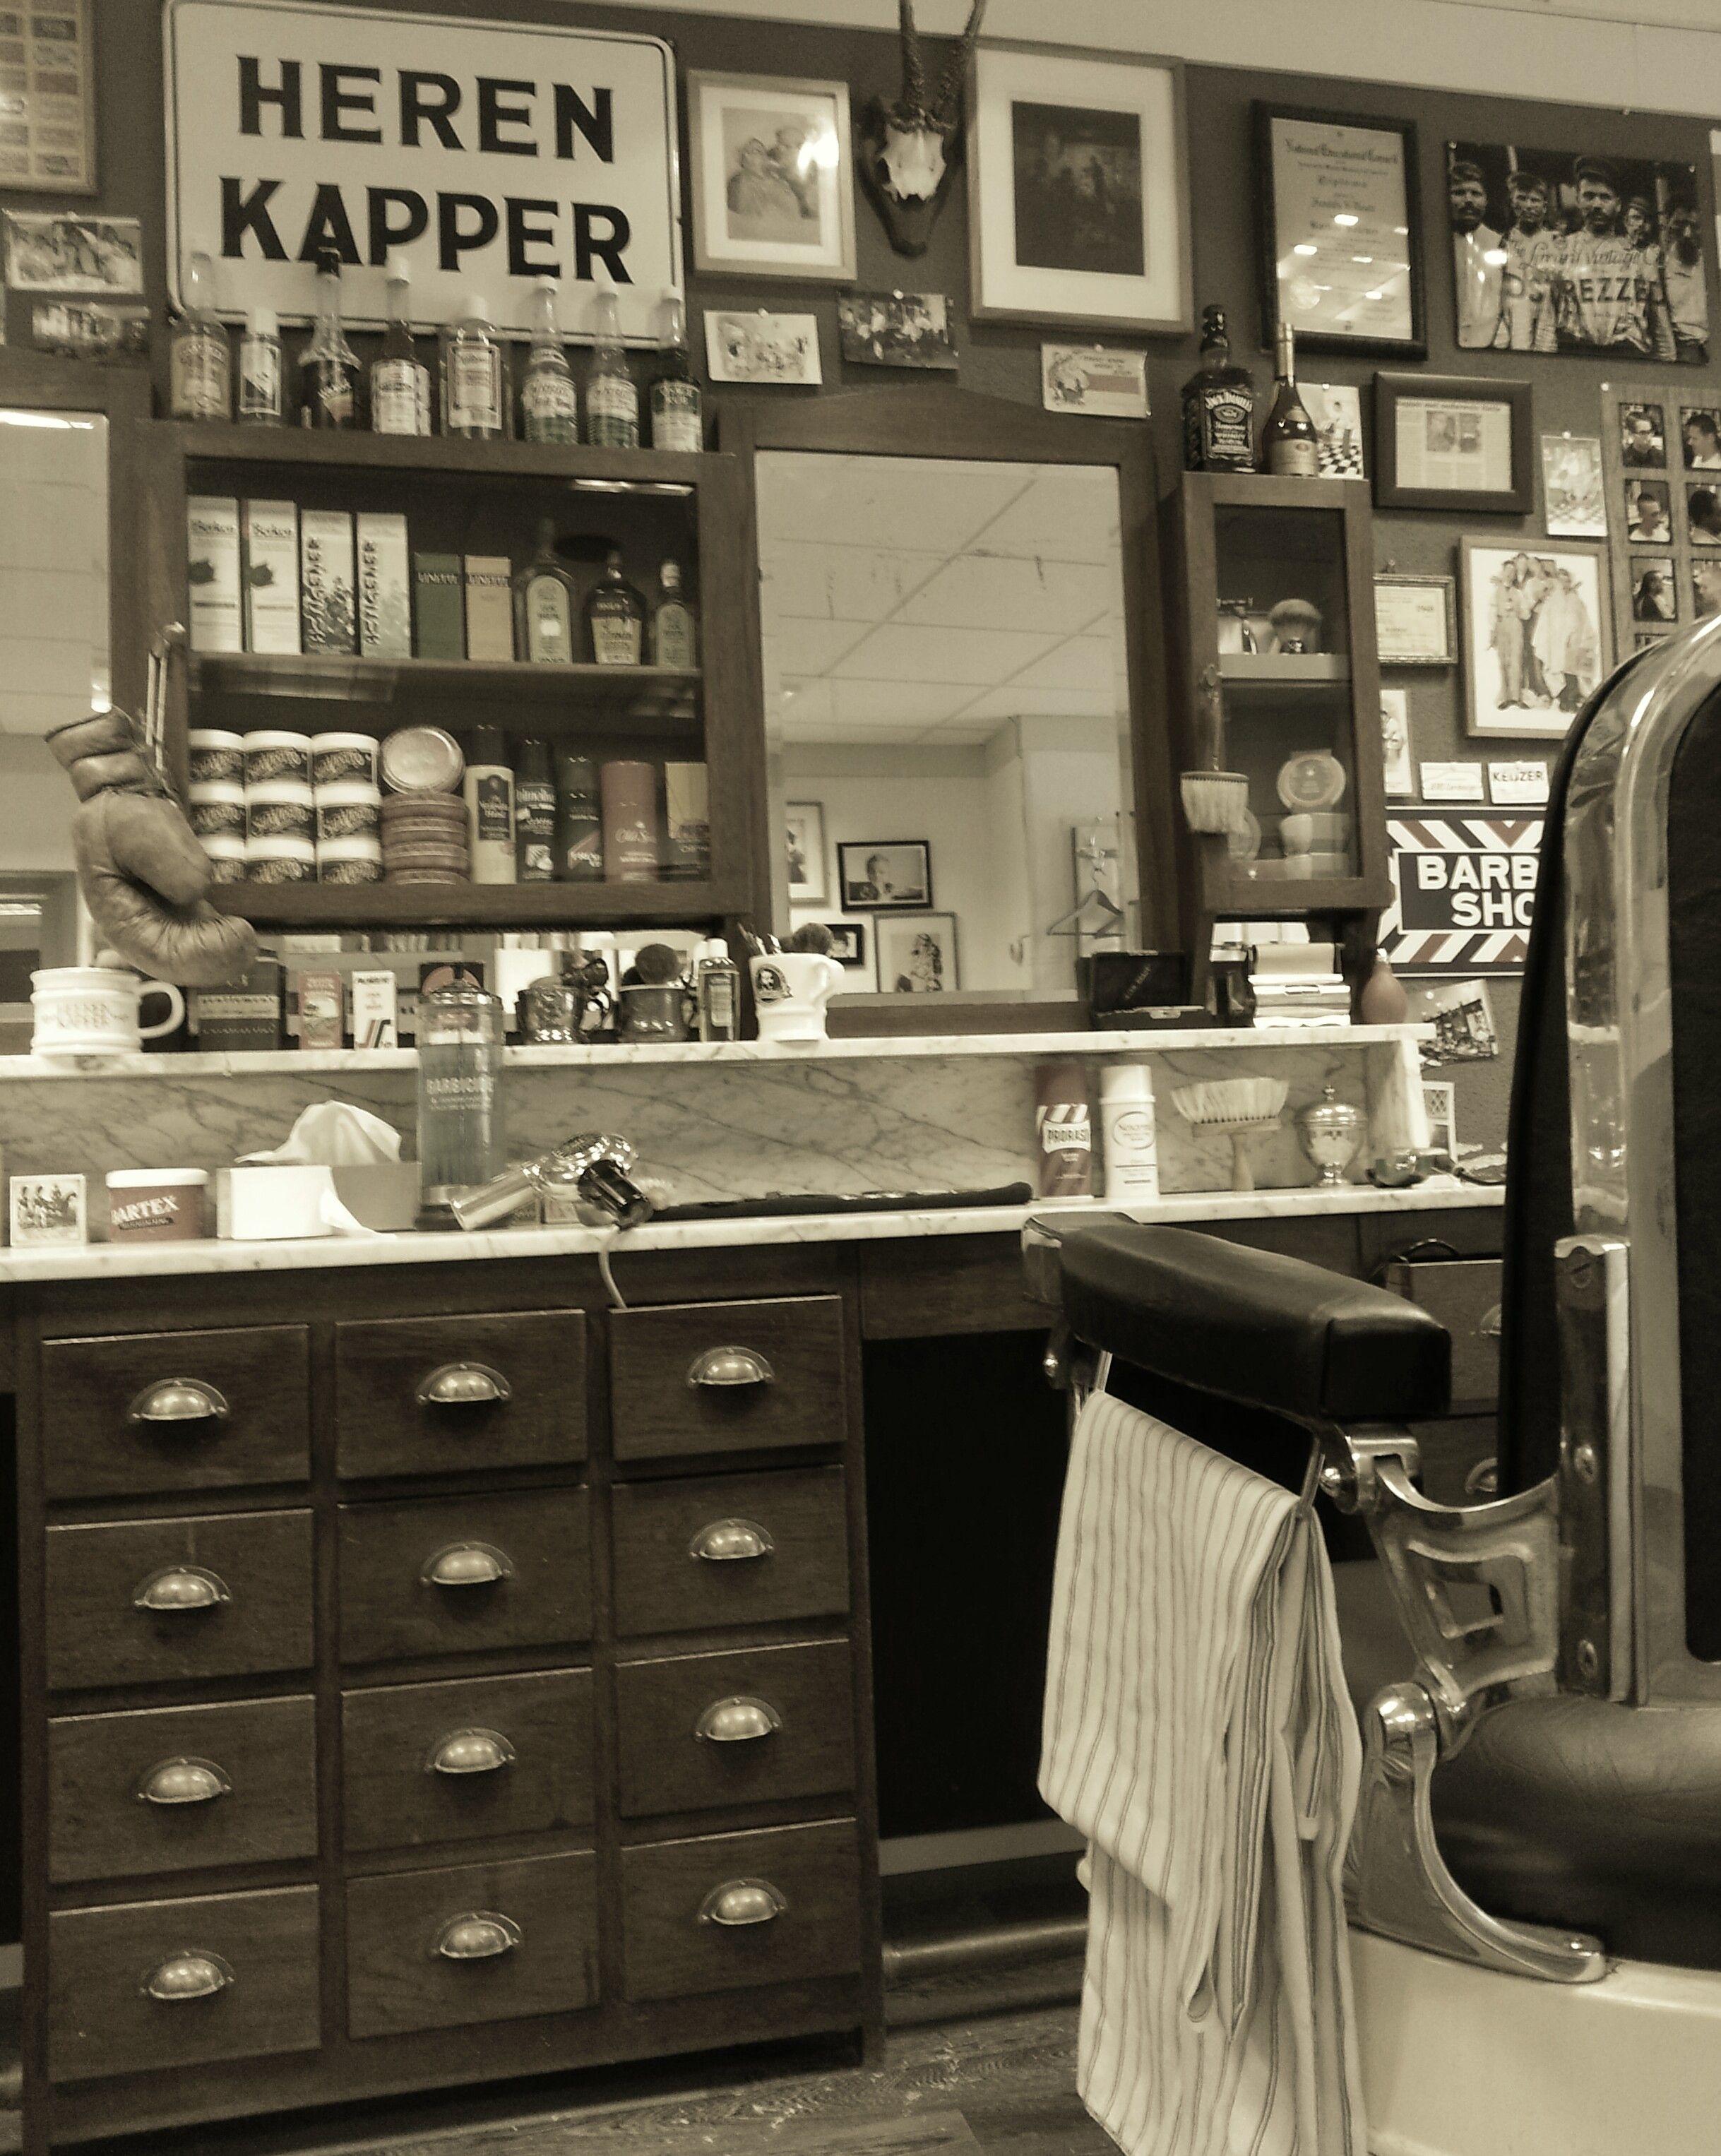 #brusjkappers #barber #barbershop #barberchair #barbersign #vintage #herenkapper #kapperszaak